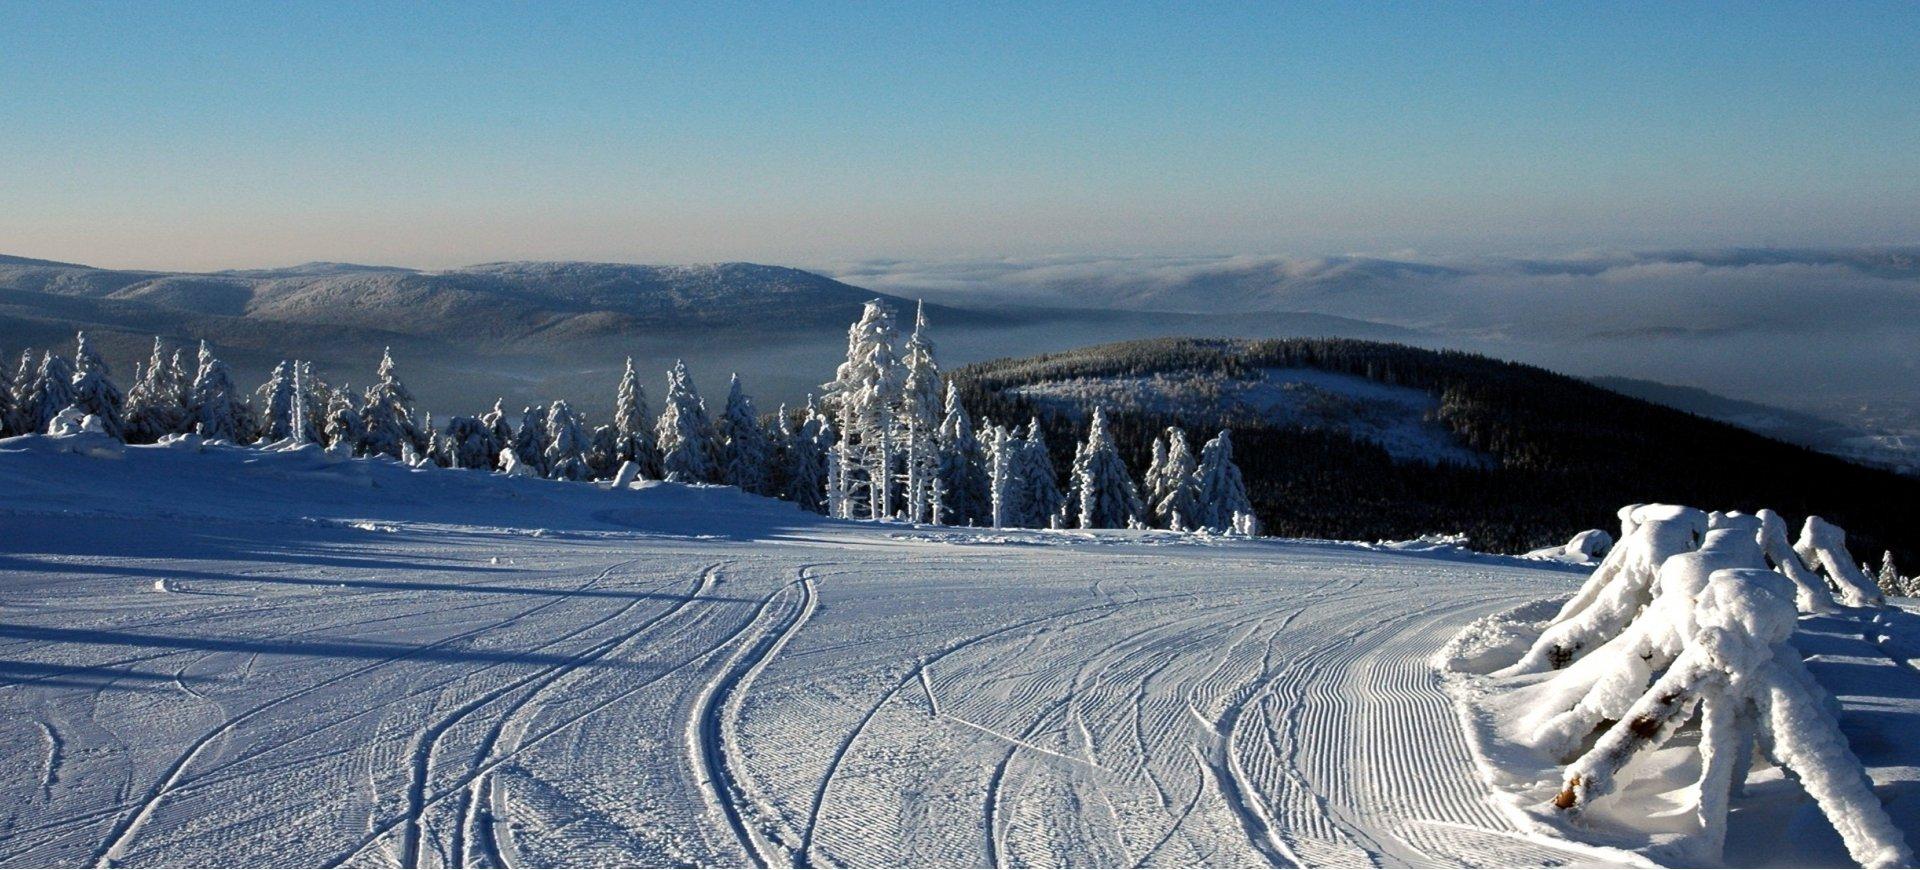 Czarna Góra - Ośrodek narciarski